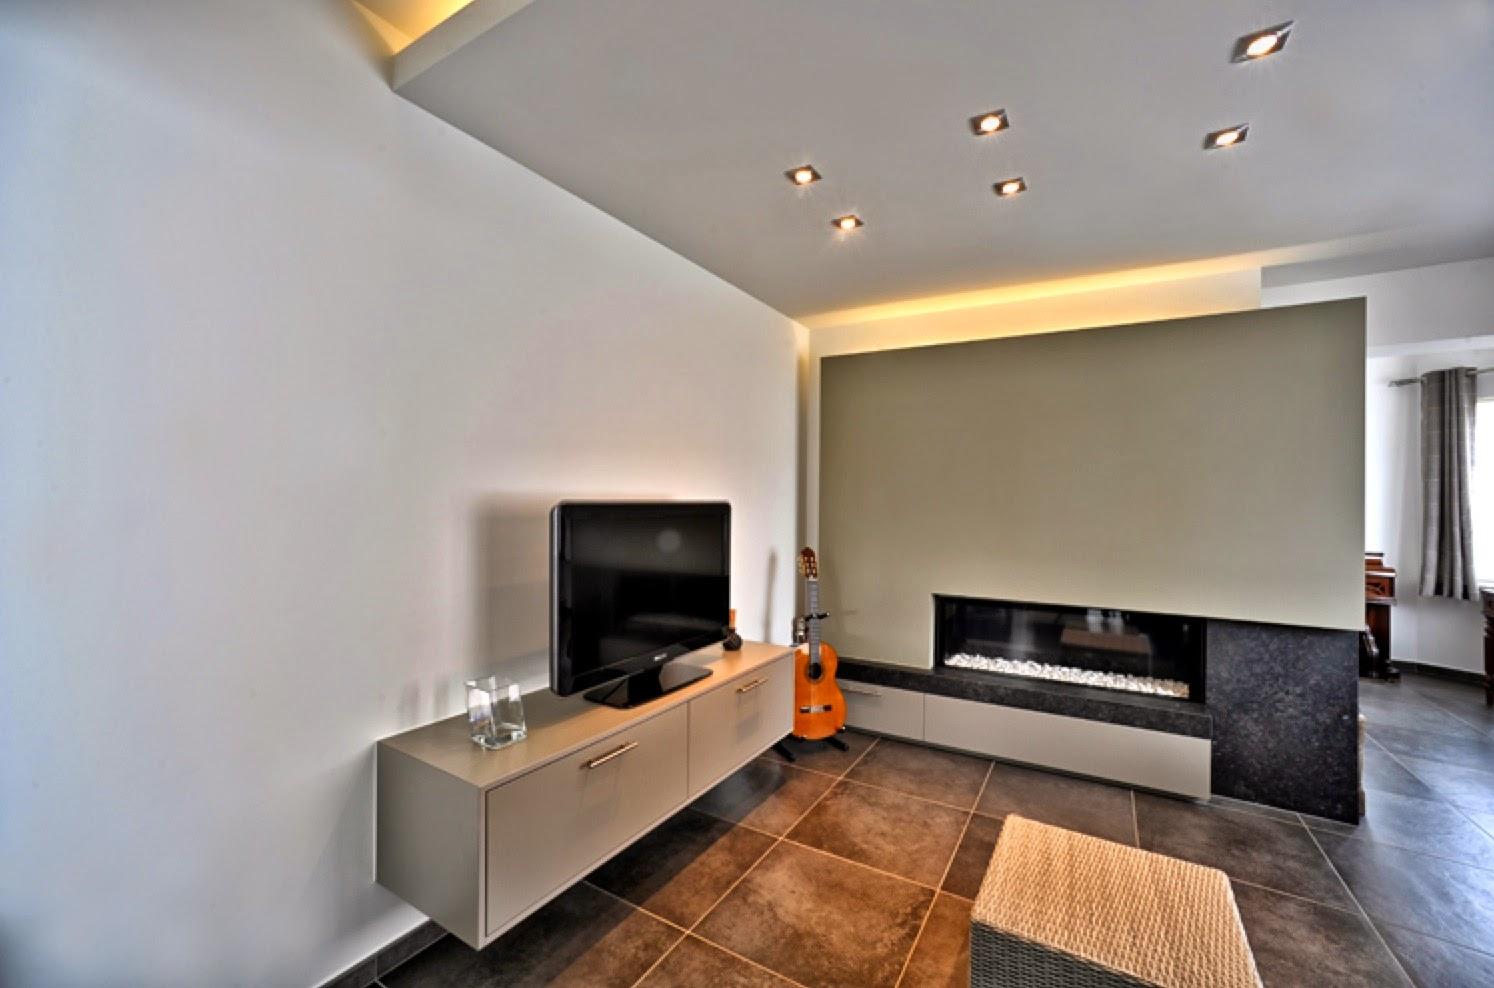 Interieur Strak Klassiek : Realisaties interieur woon en eetkamers interieurbouw claesen